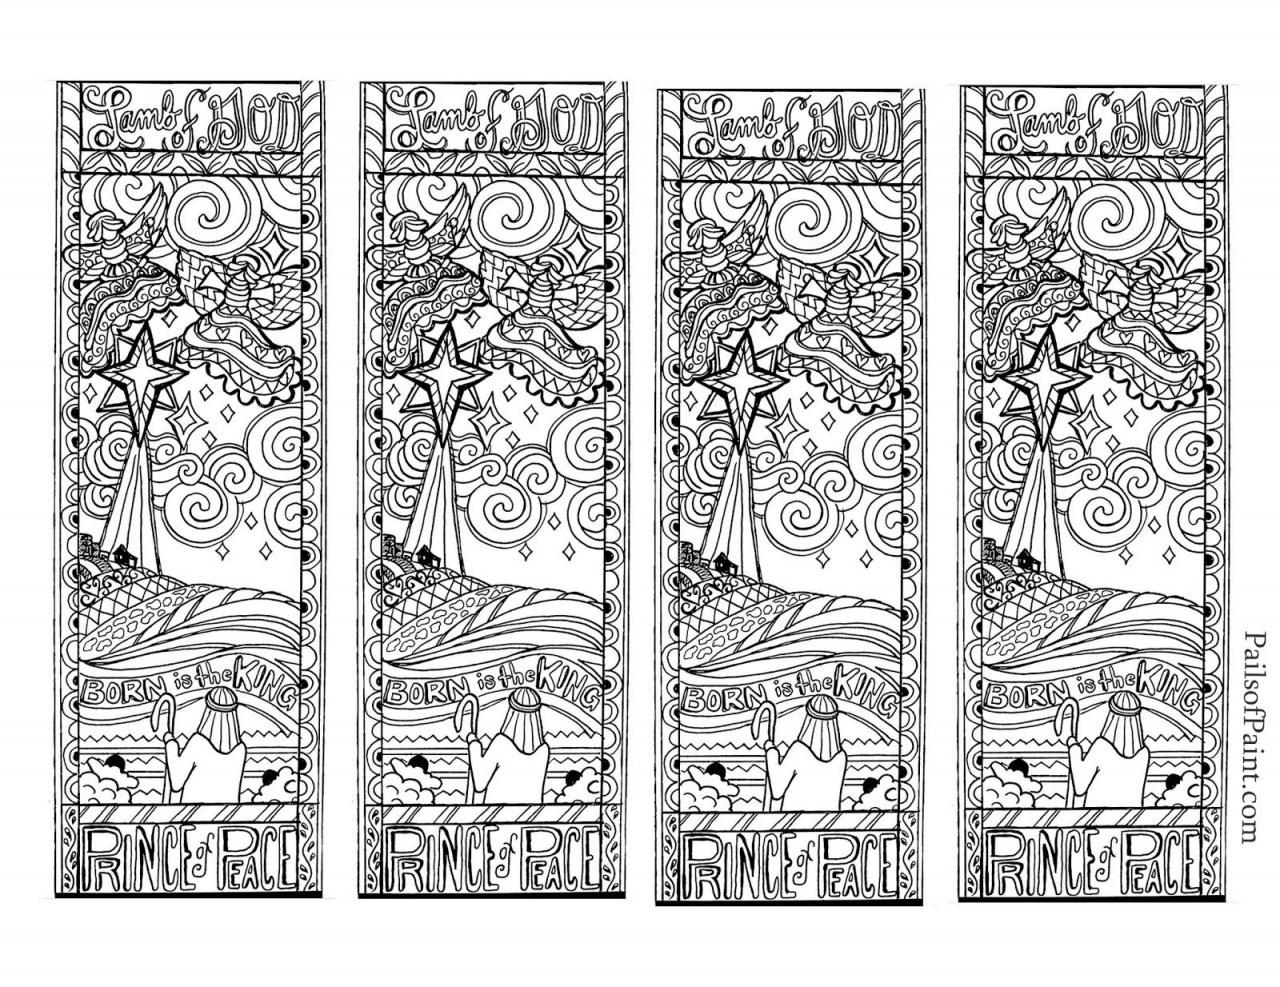 Bookmark Coloring Pages Bookmark Coloring Pages Free Printable - Free Printable Bookmarks To Color